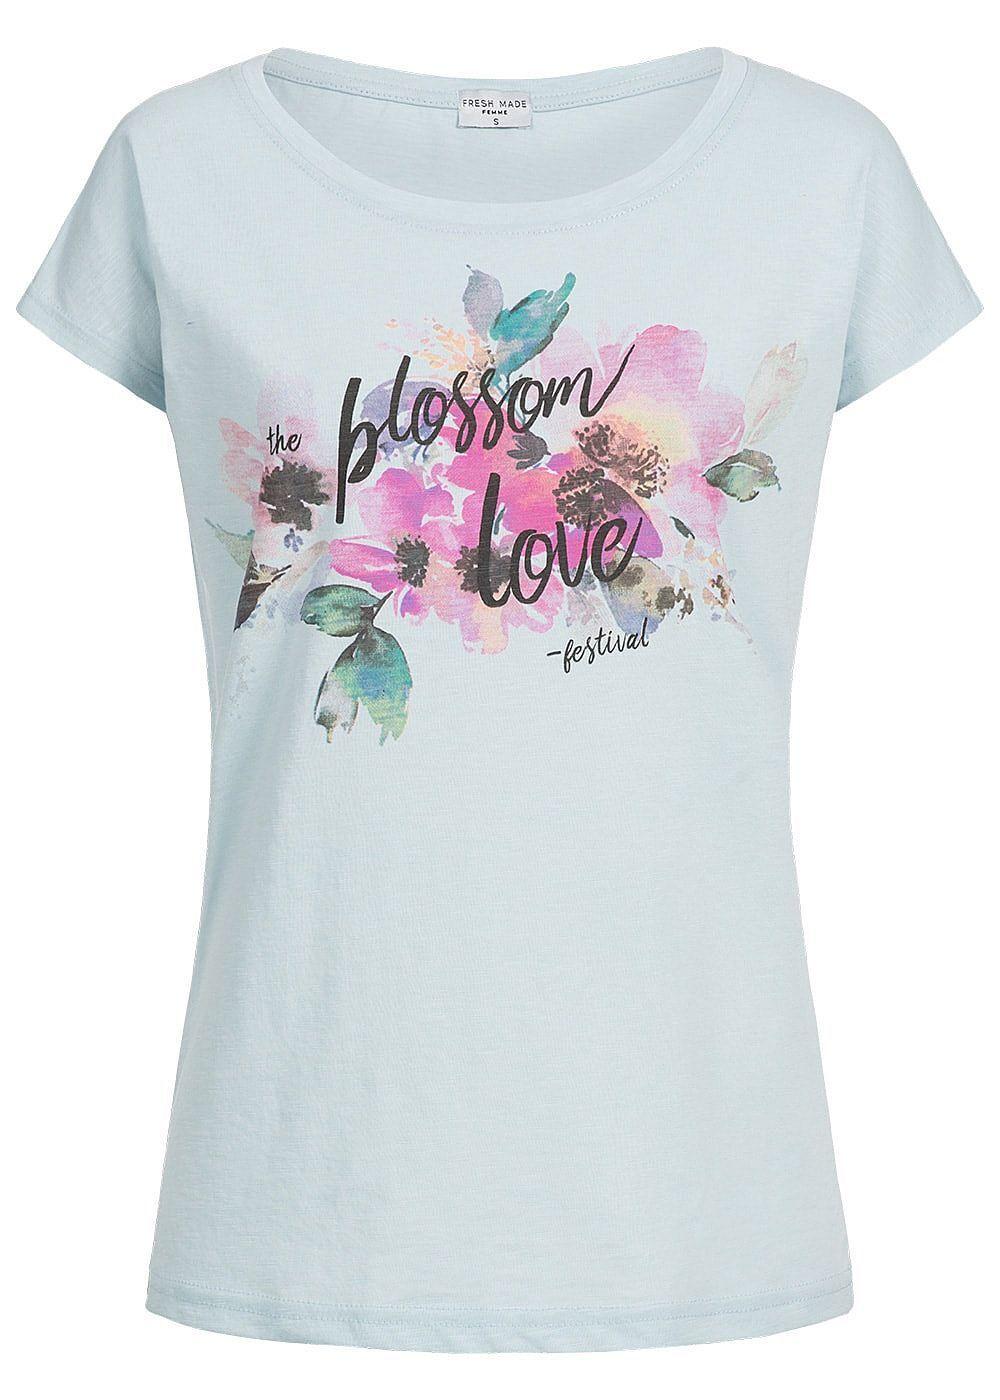 50% OFF B18042588 Damen Eight2Nine T-Shirt Kurzarm Blumen Print hell blau rosa